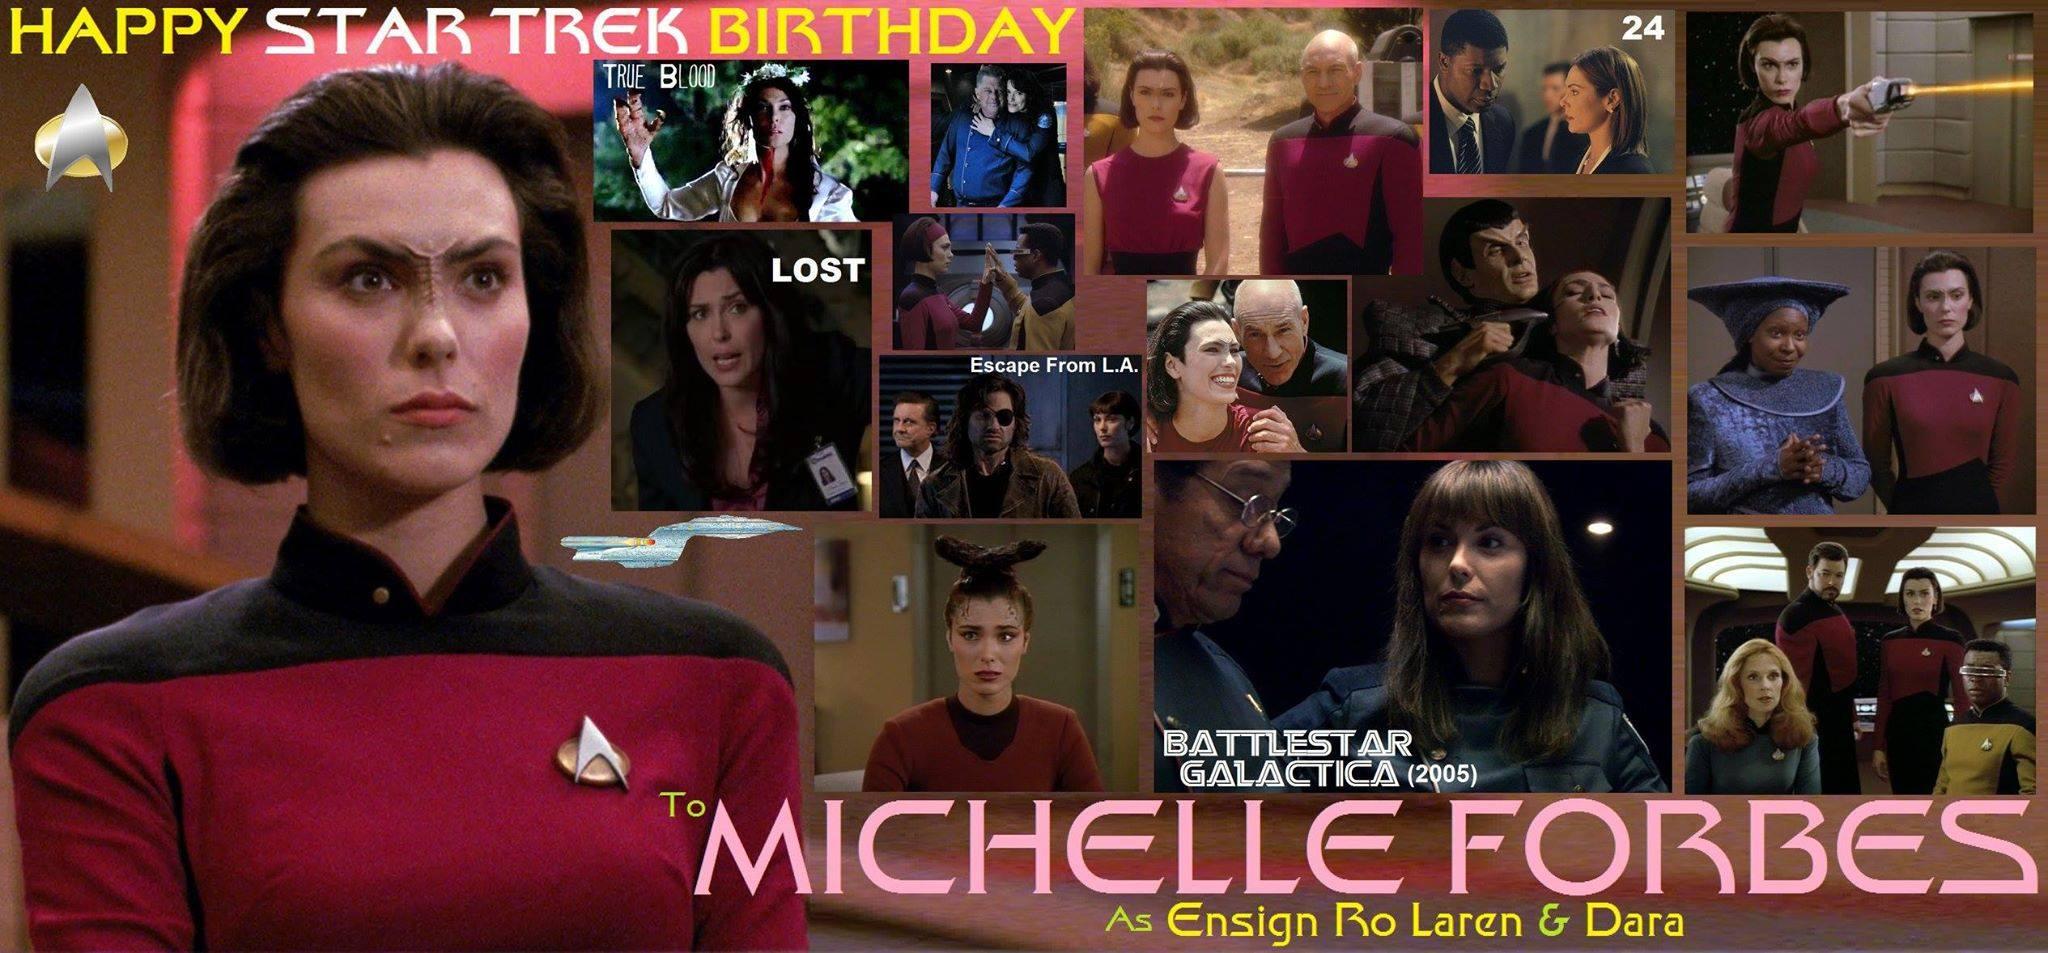 Happy birthday Michelle Forbes, born January 8, 1965 ... Michelle Forbes Birthday